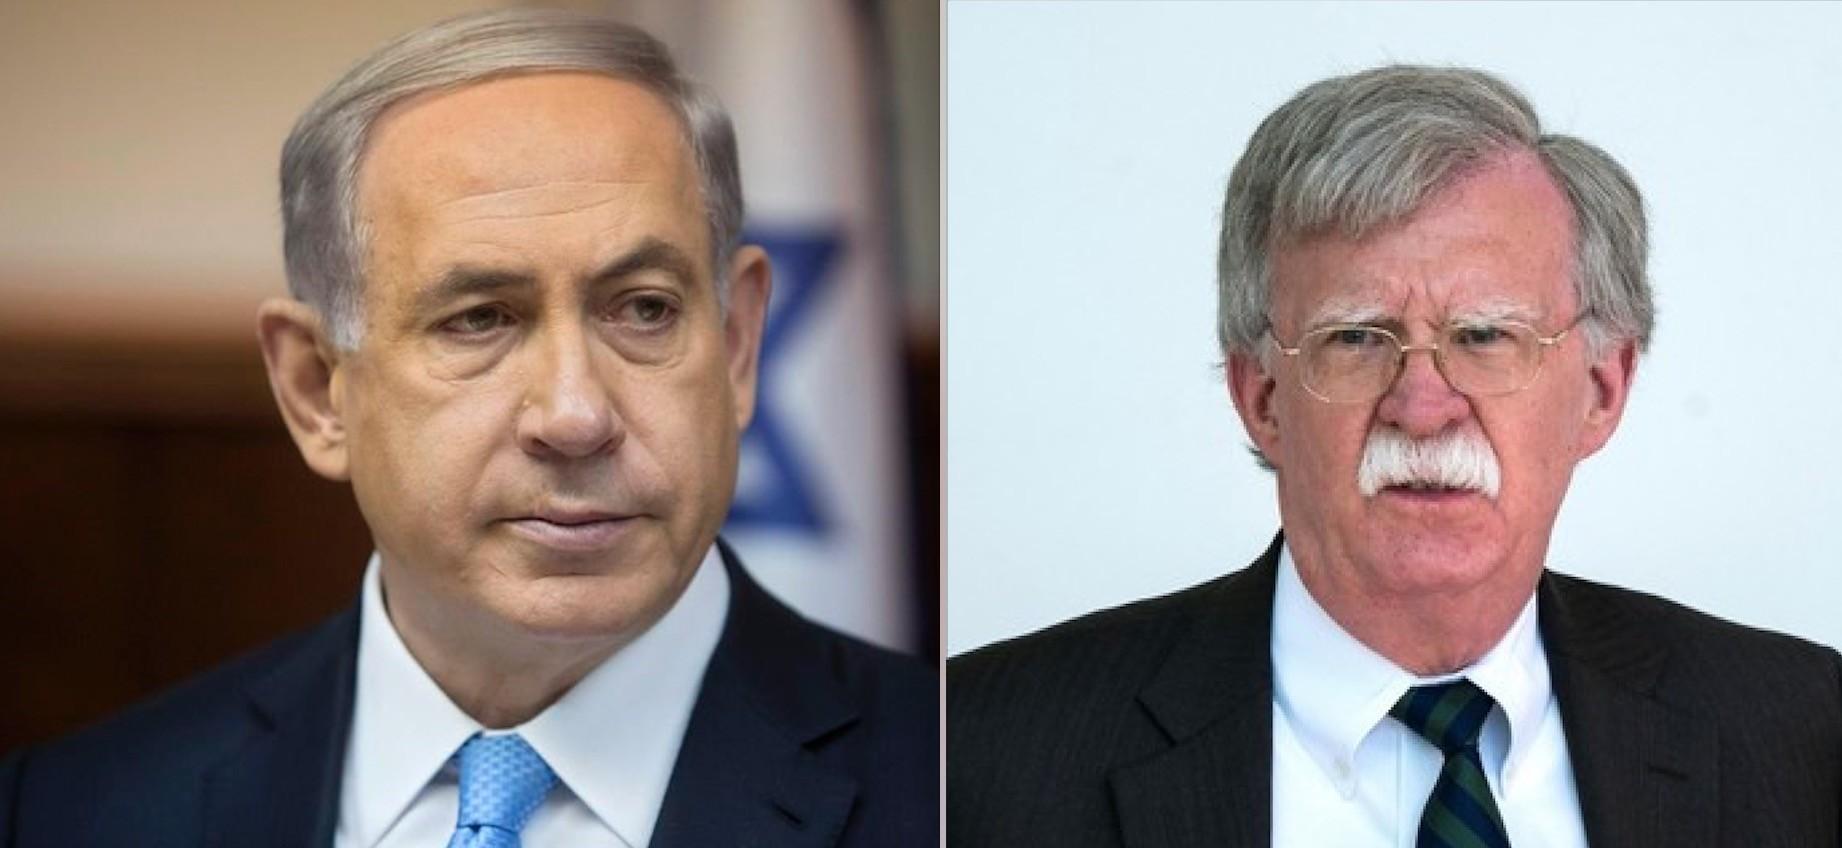 Netanyahu (L) and Bolton